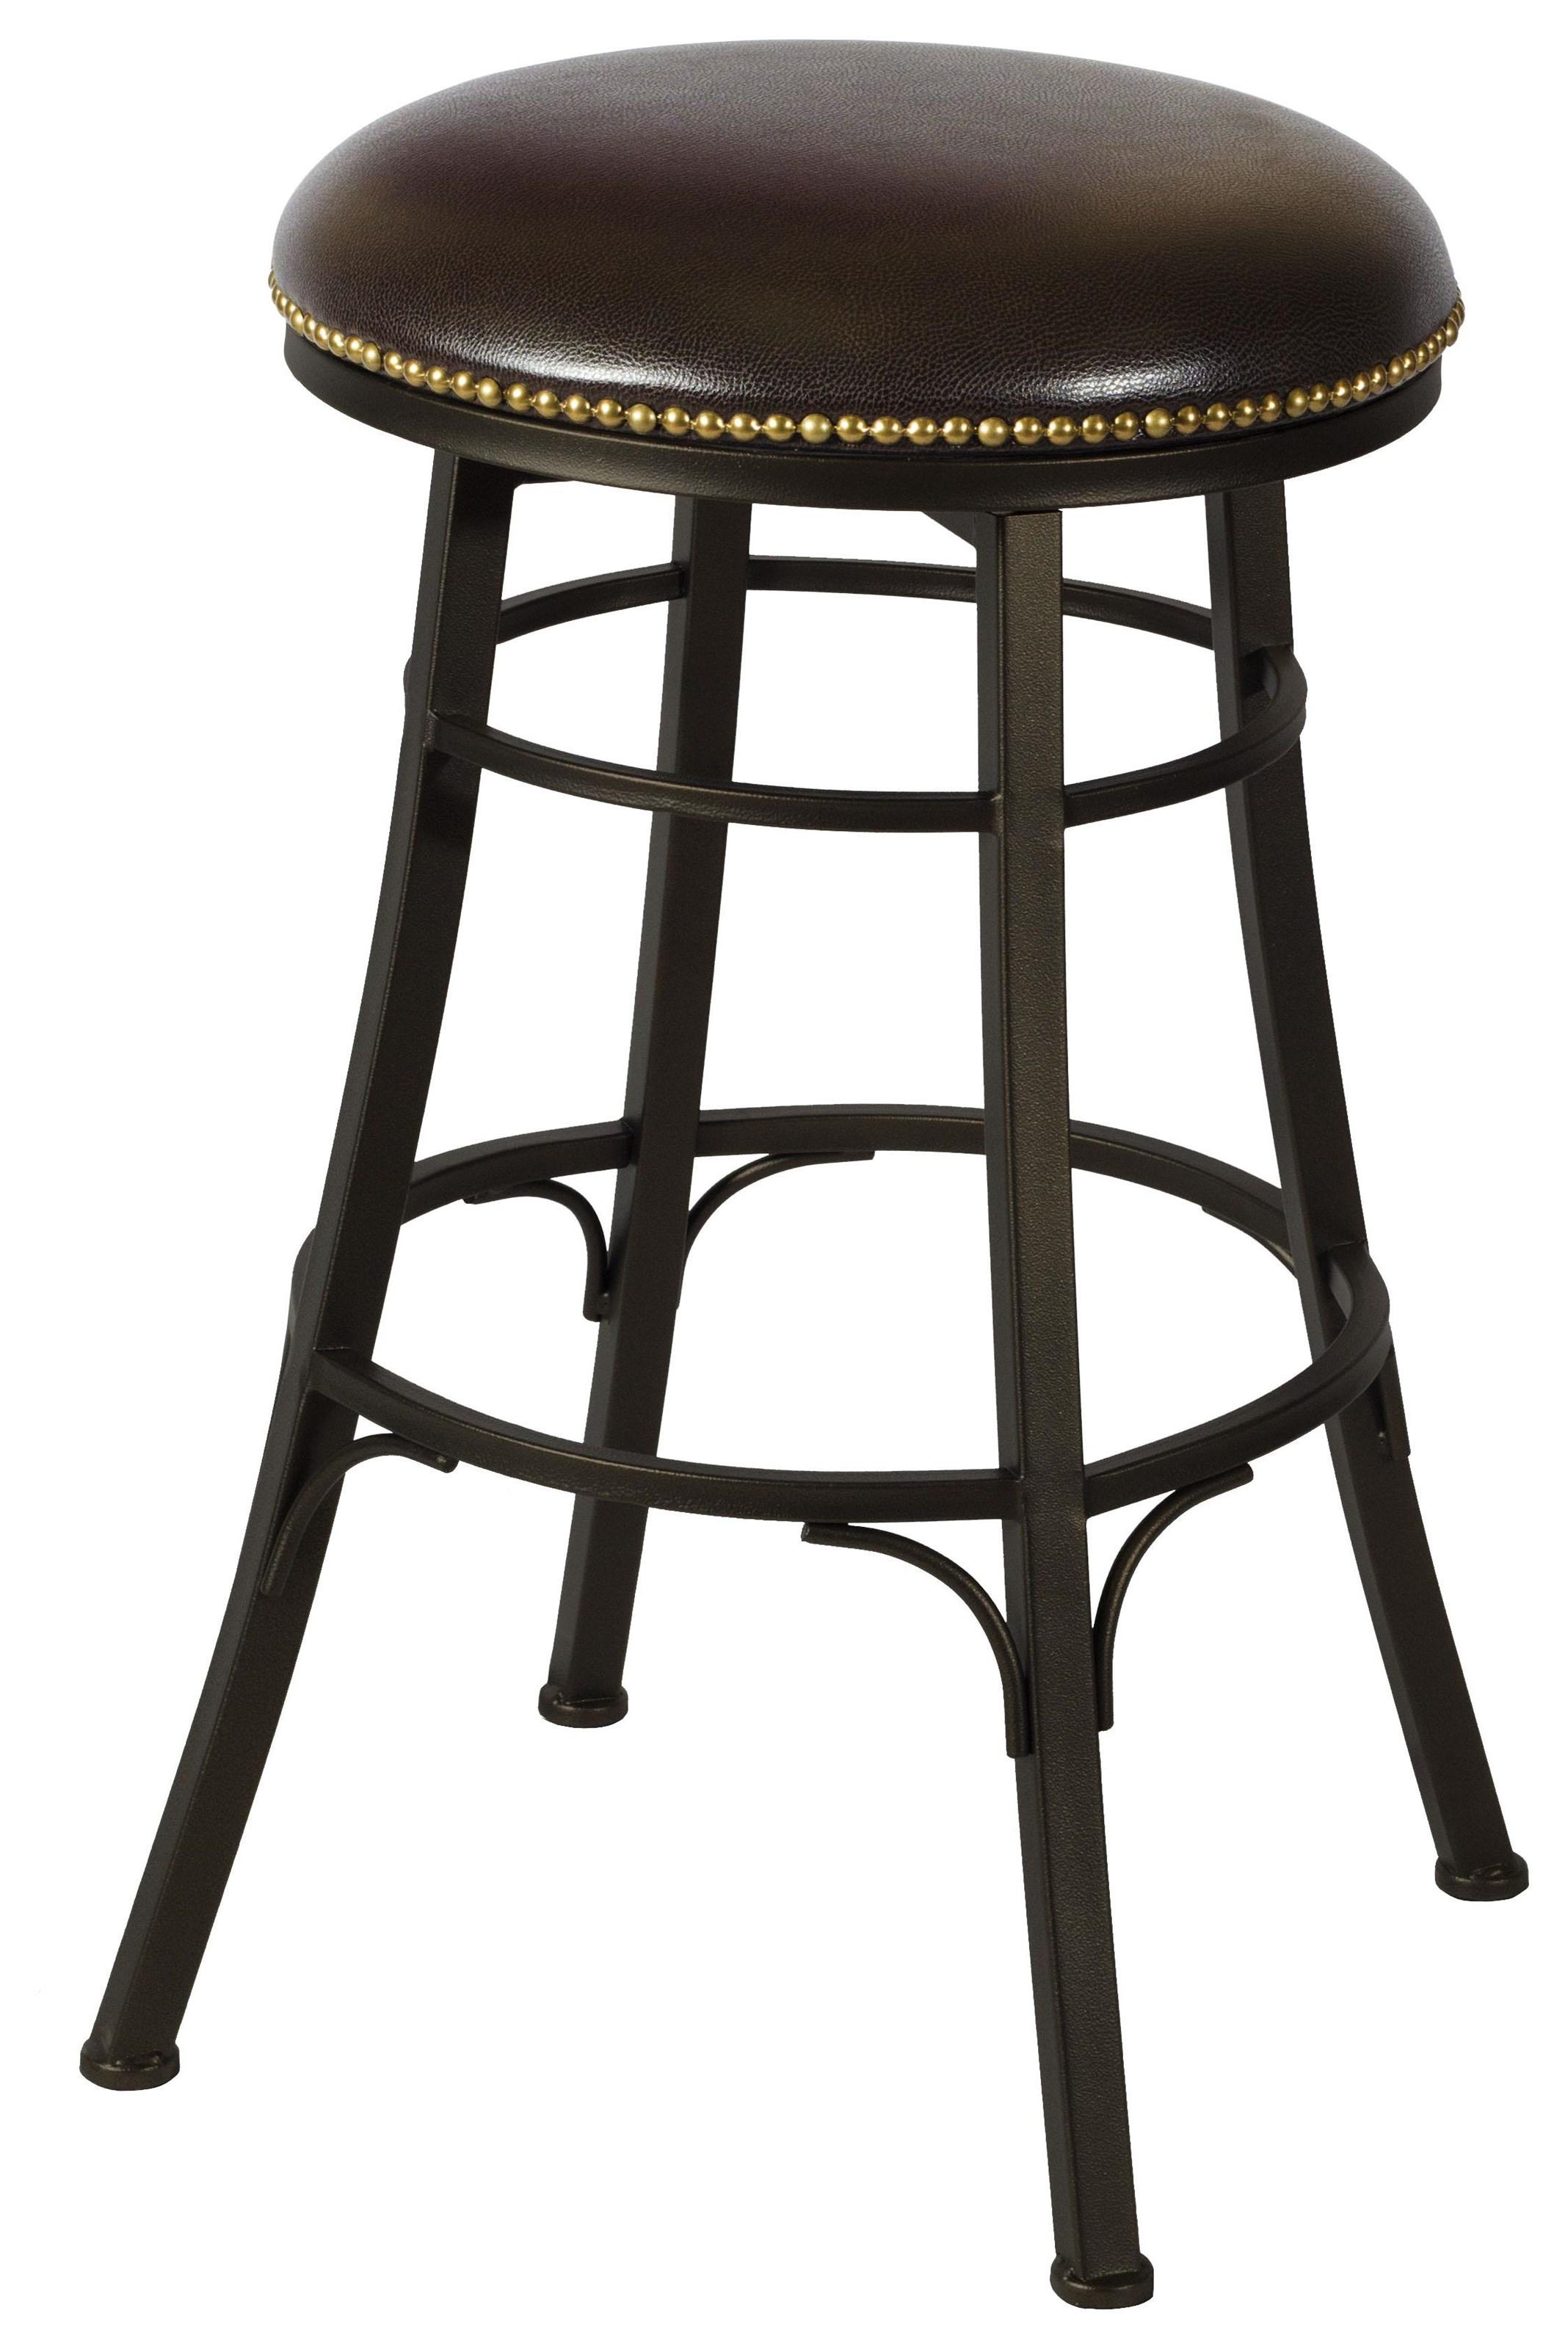 Trendy  bali bar height bar stool at Walker's Furniture